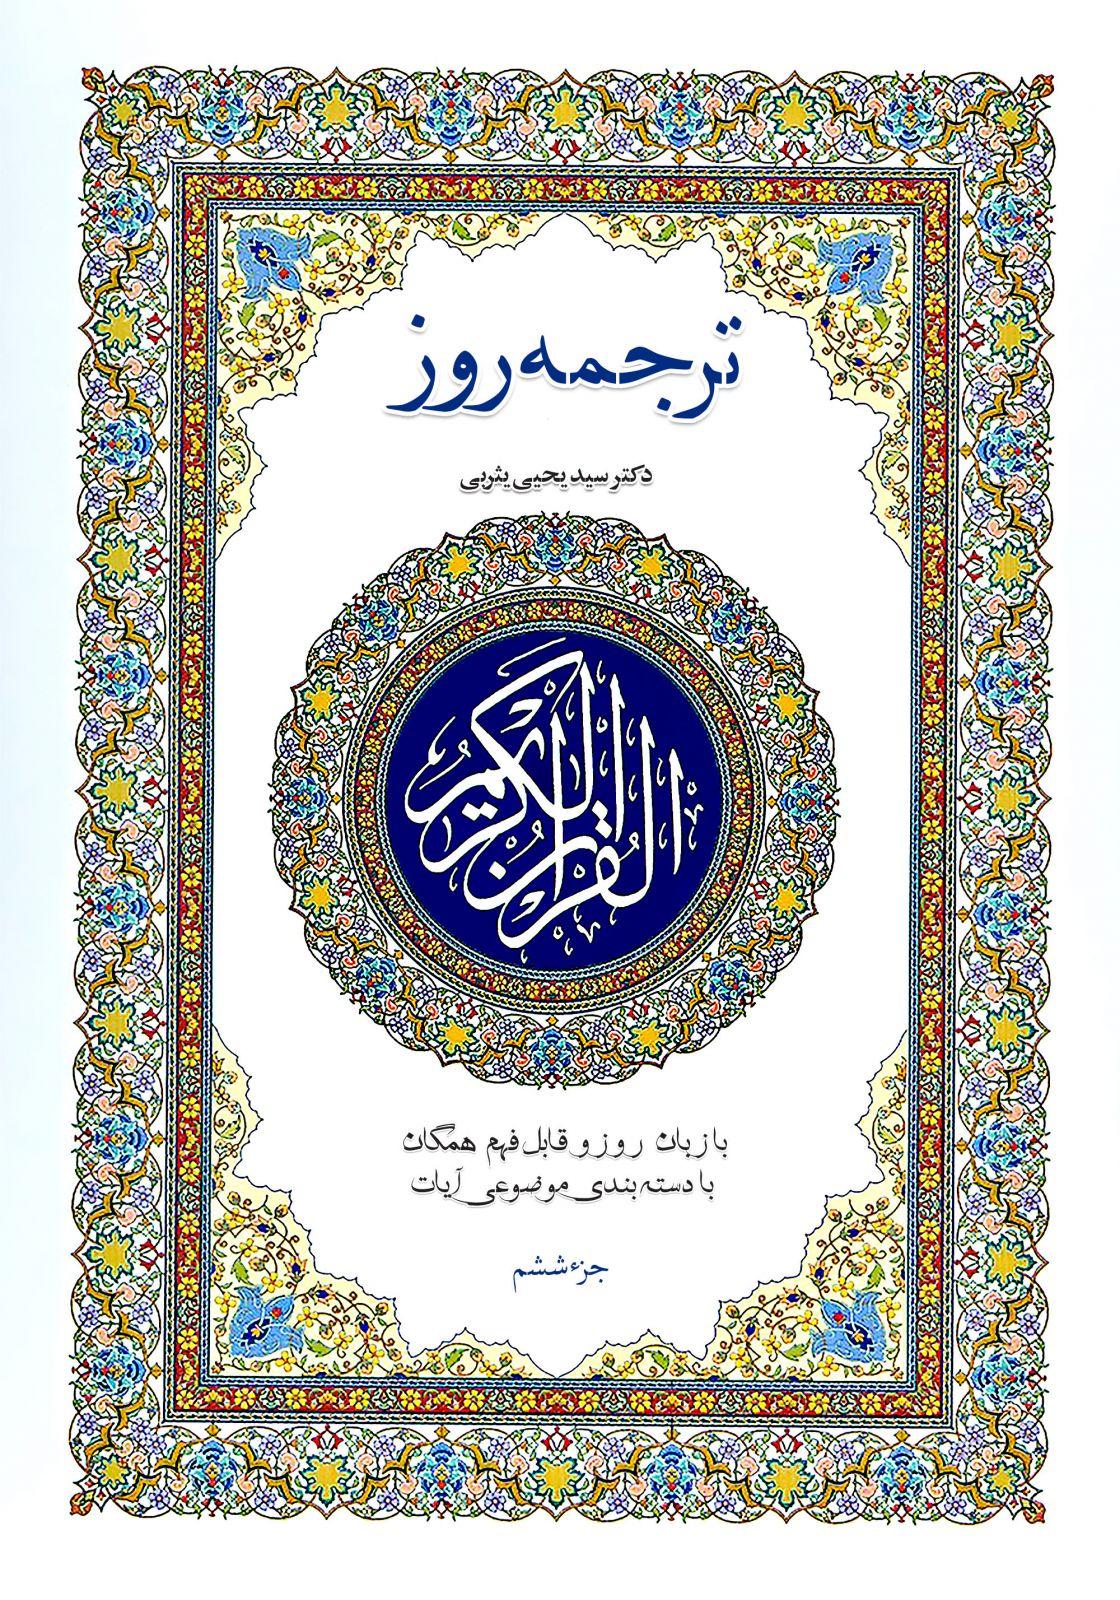 قرآن کریم (جزء ششم)